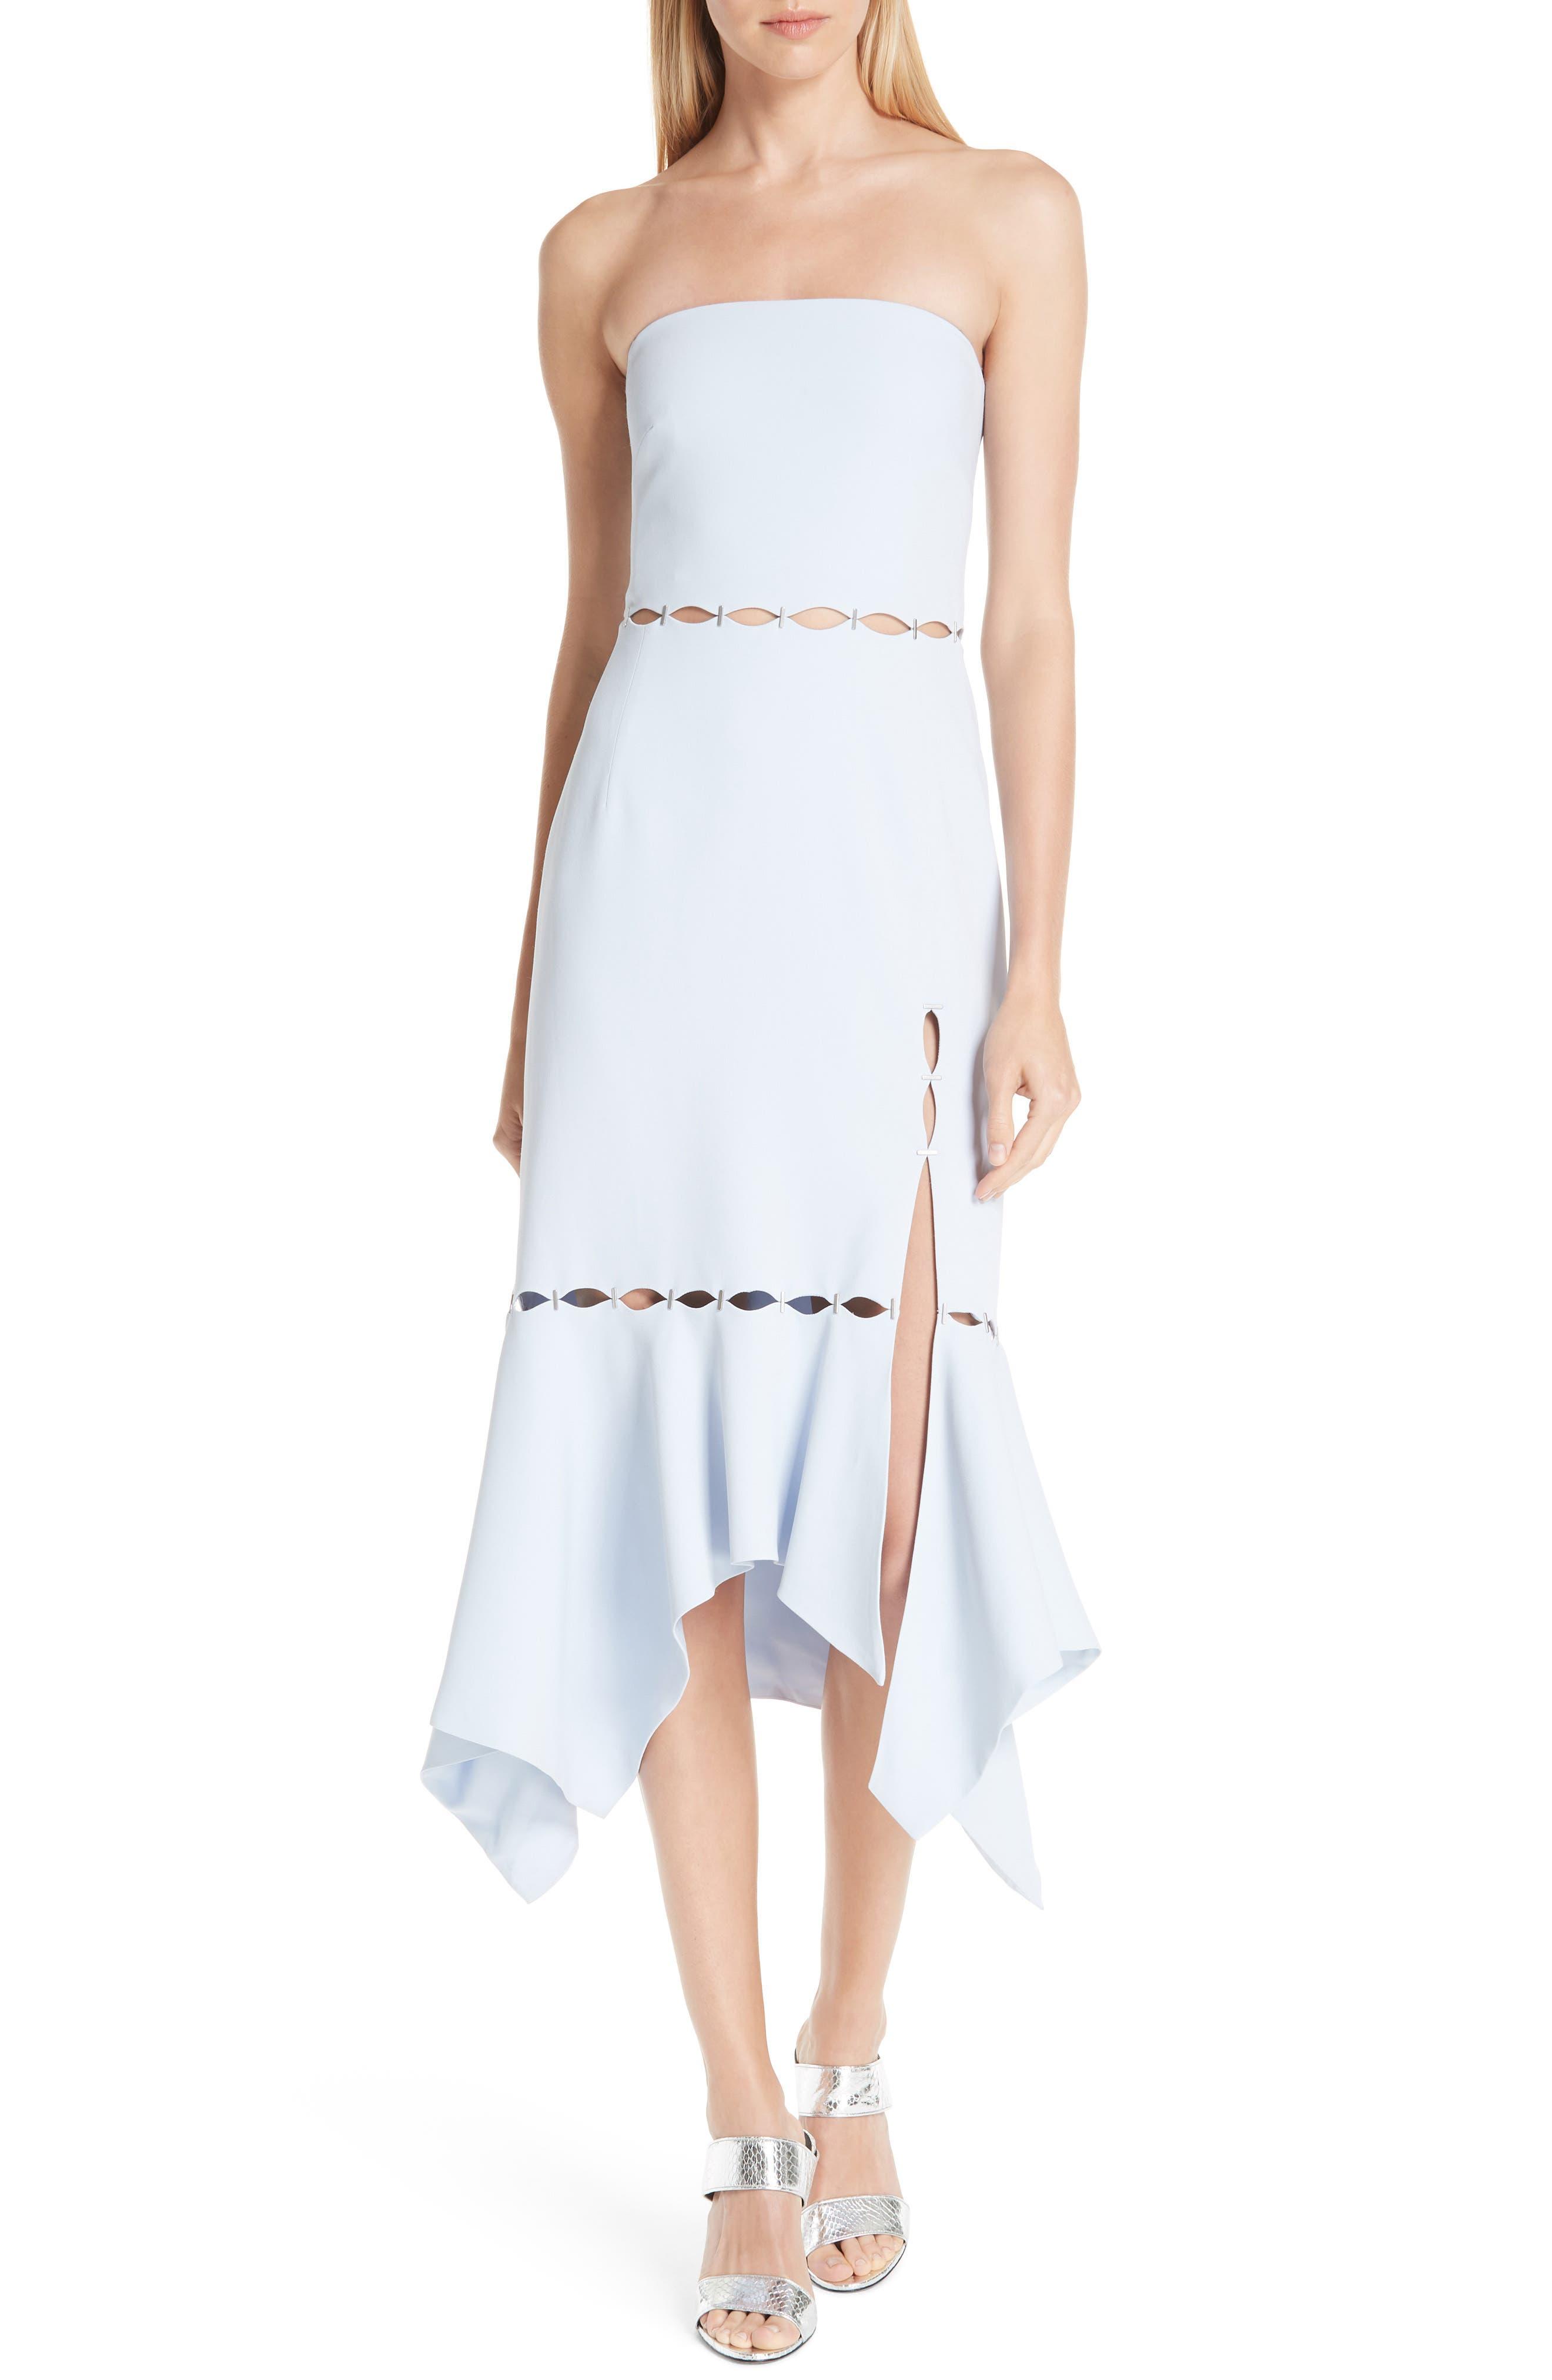 Jonathan Simkhai Stapled Crepe Strapless Dress